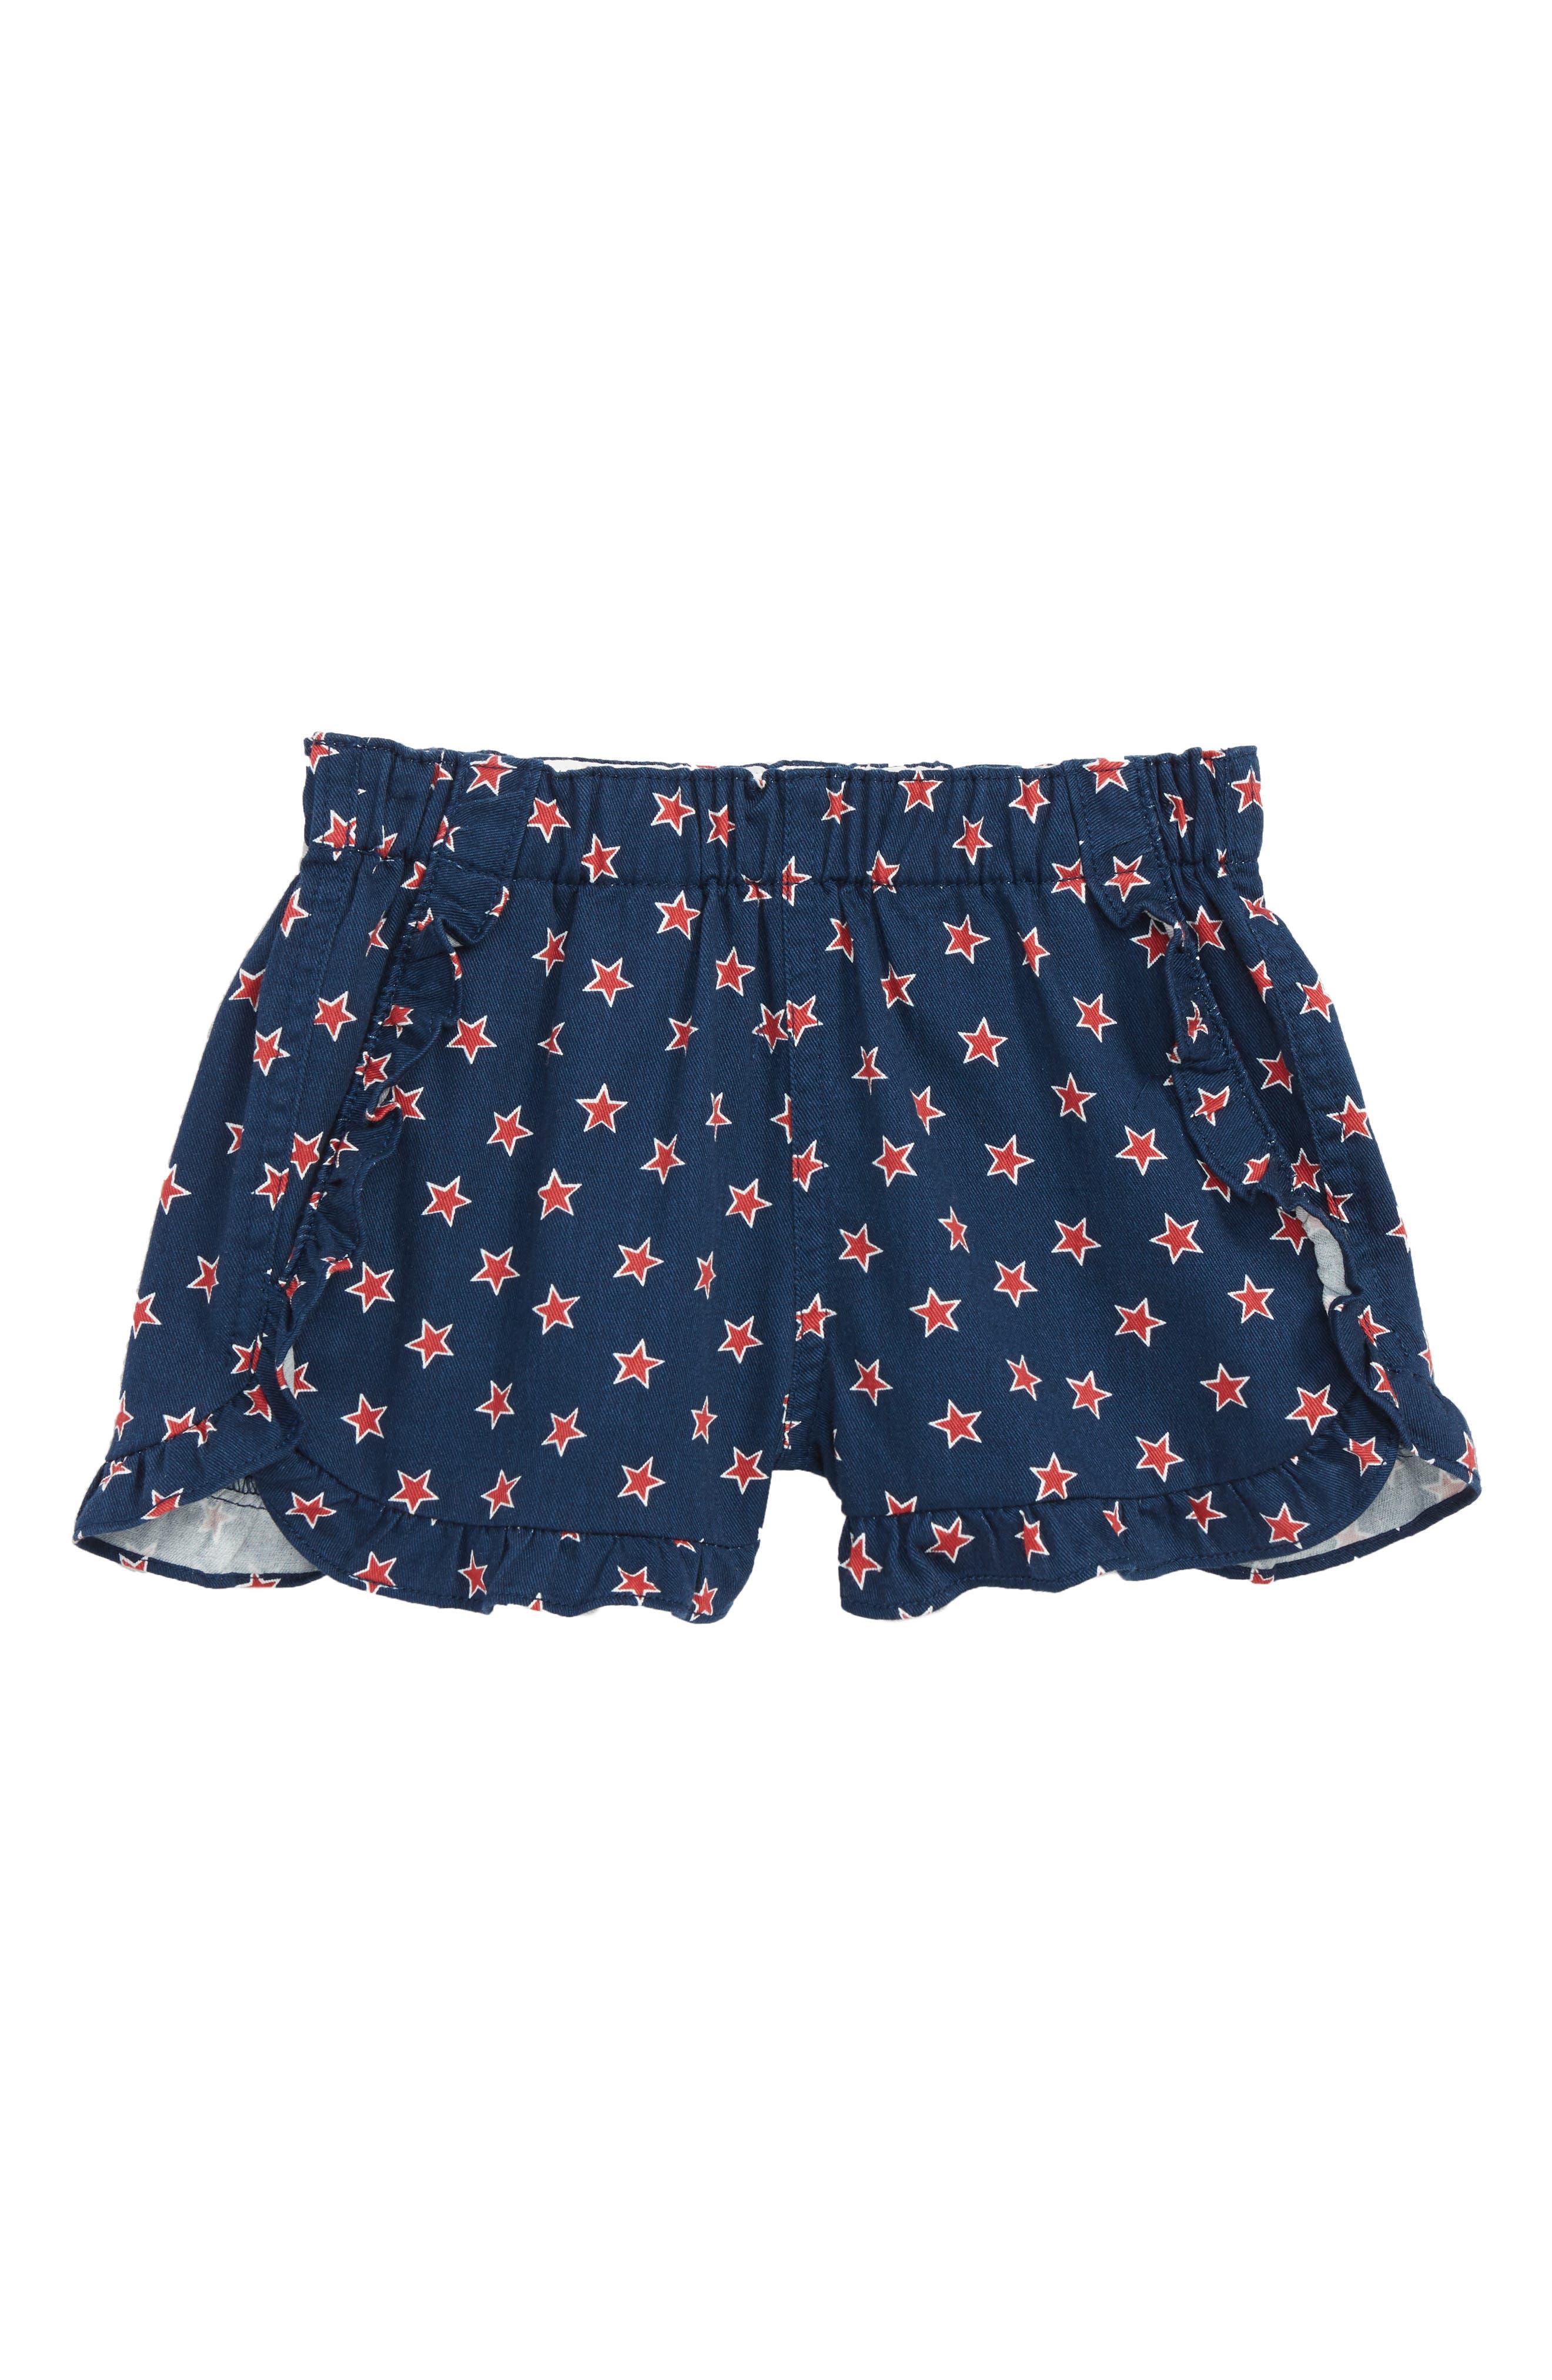 Star Print Ruffle Pull-On Shorts,                         Main,                         color, Dark Indigo